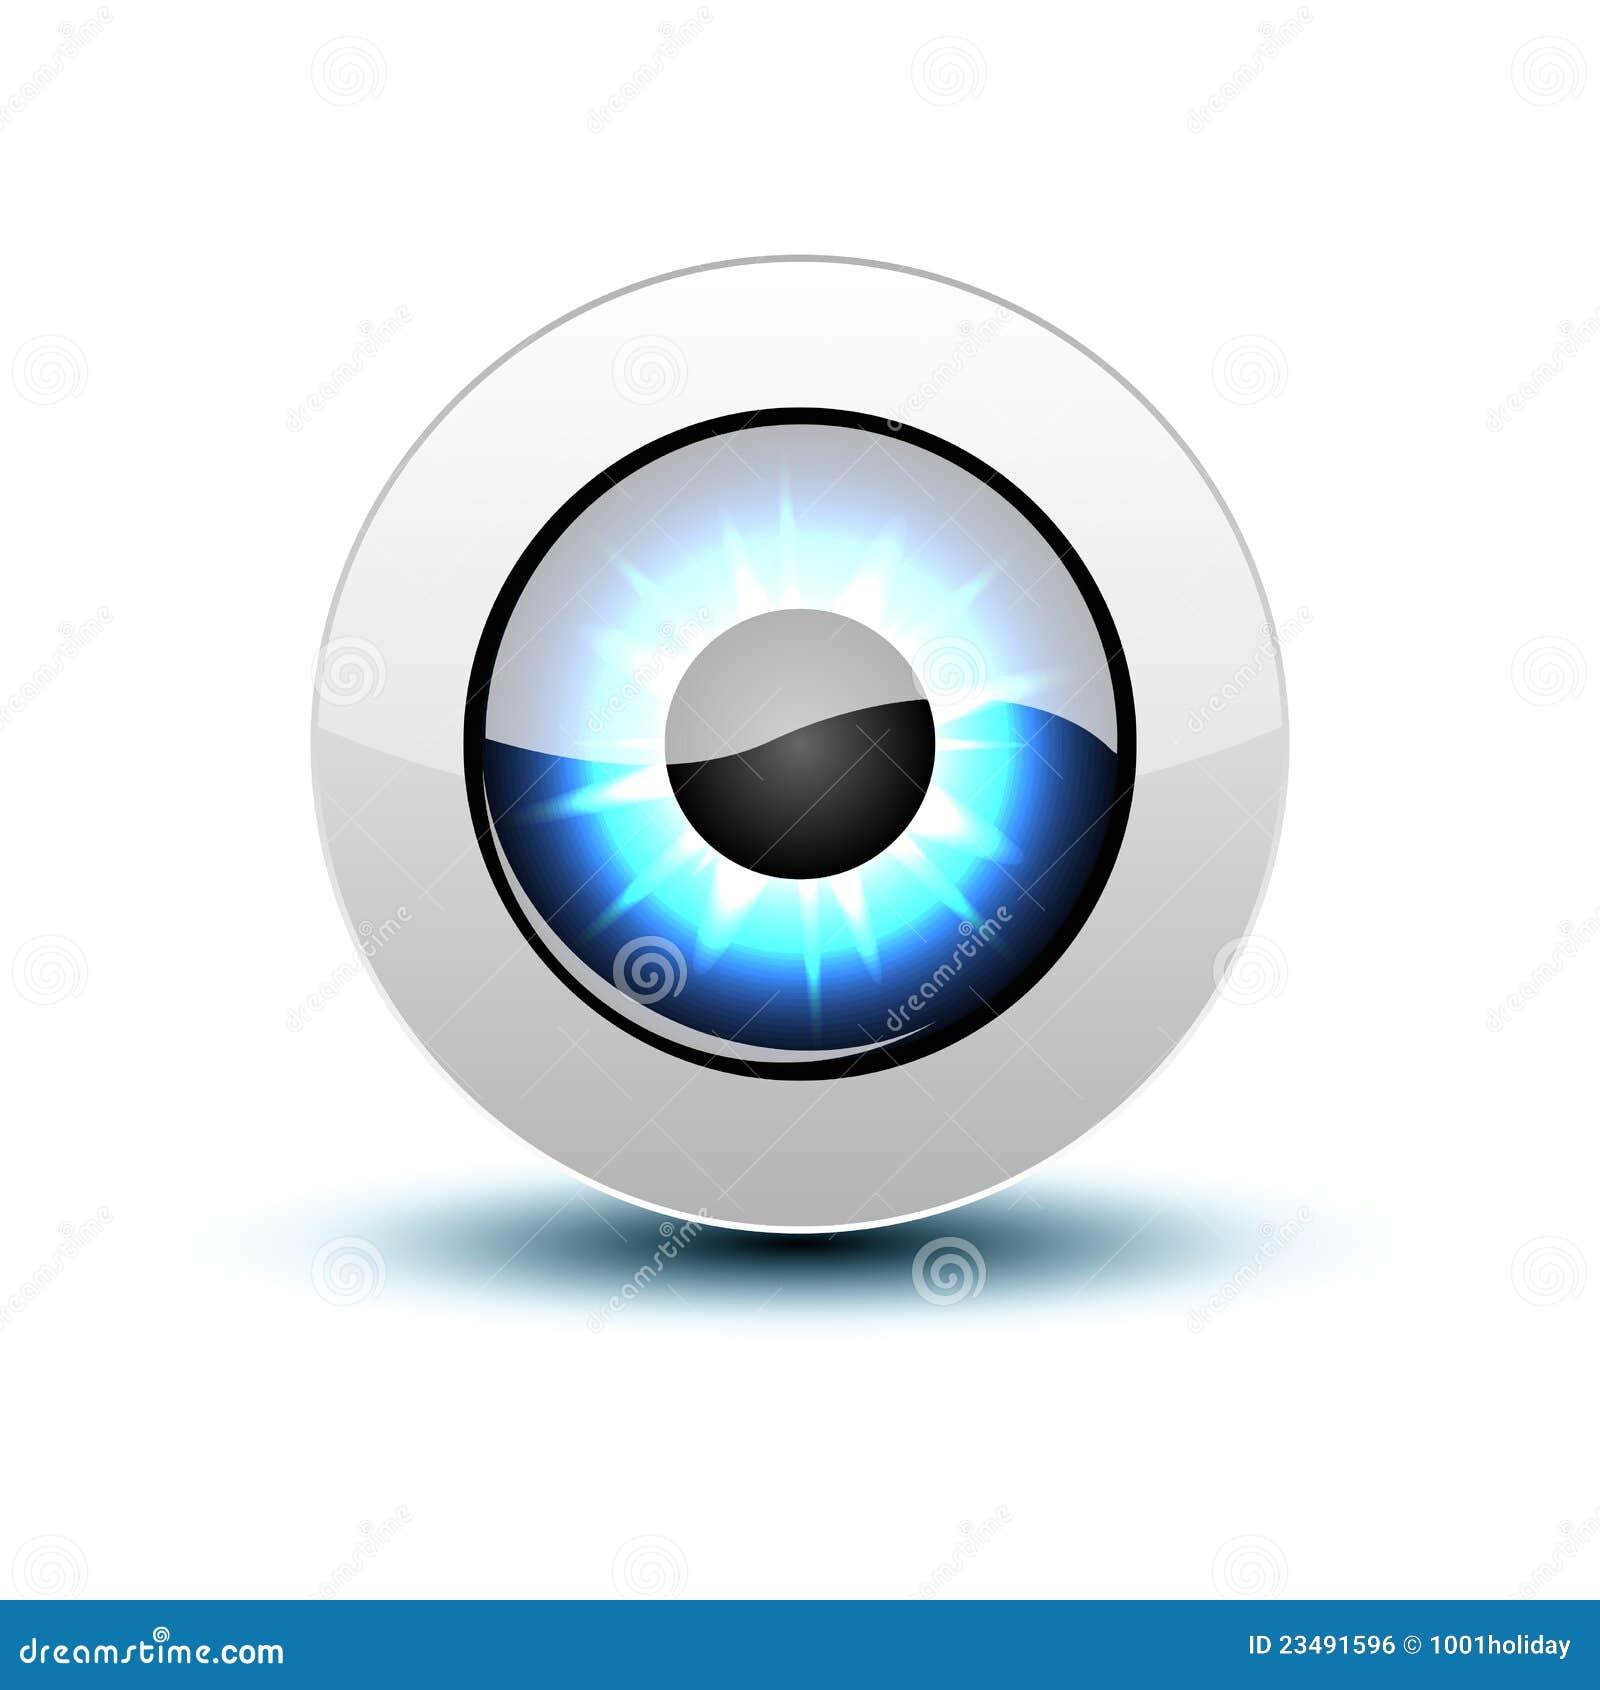 vector eye icon royalty free stock image image 23491596 free clipart piano keys free piano clipart illustrations